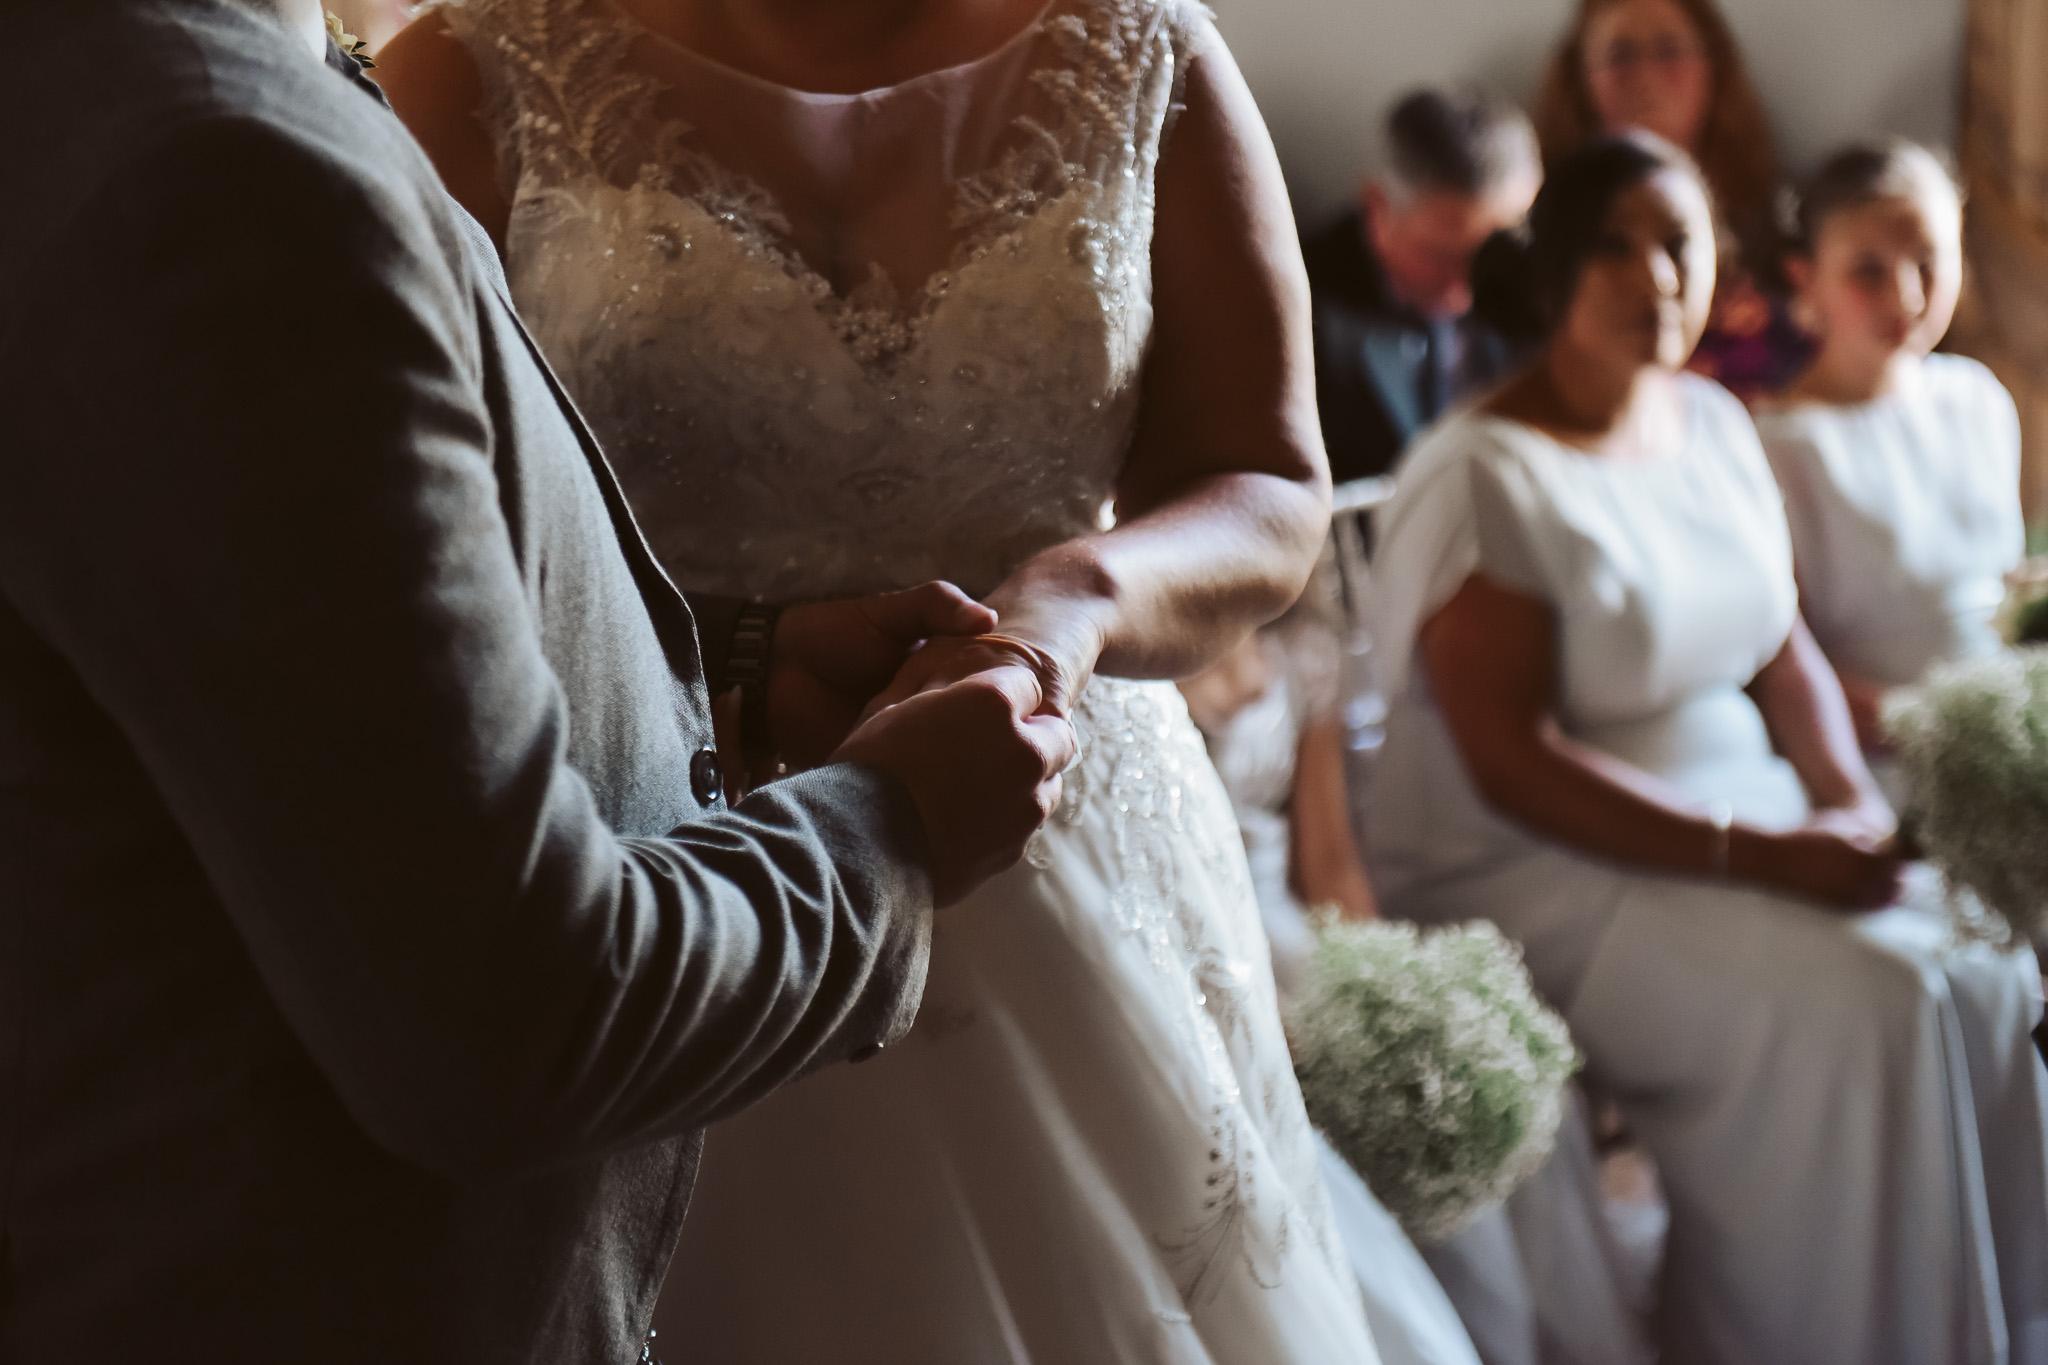 Groom placing wedding ring on bride's finger